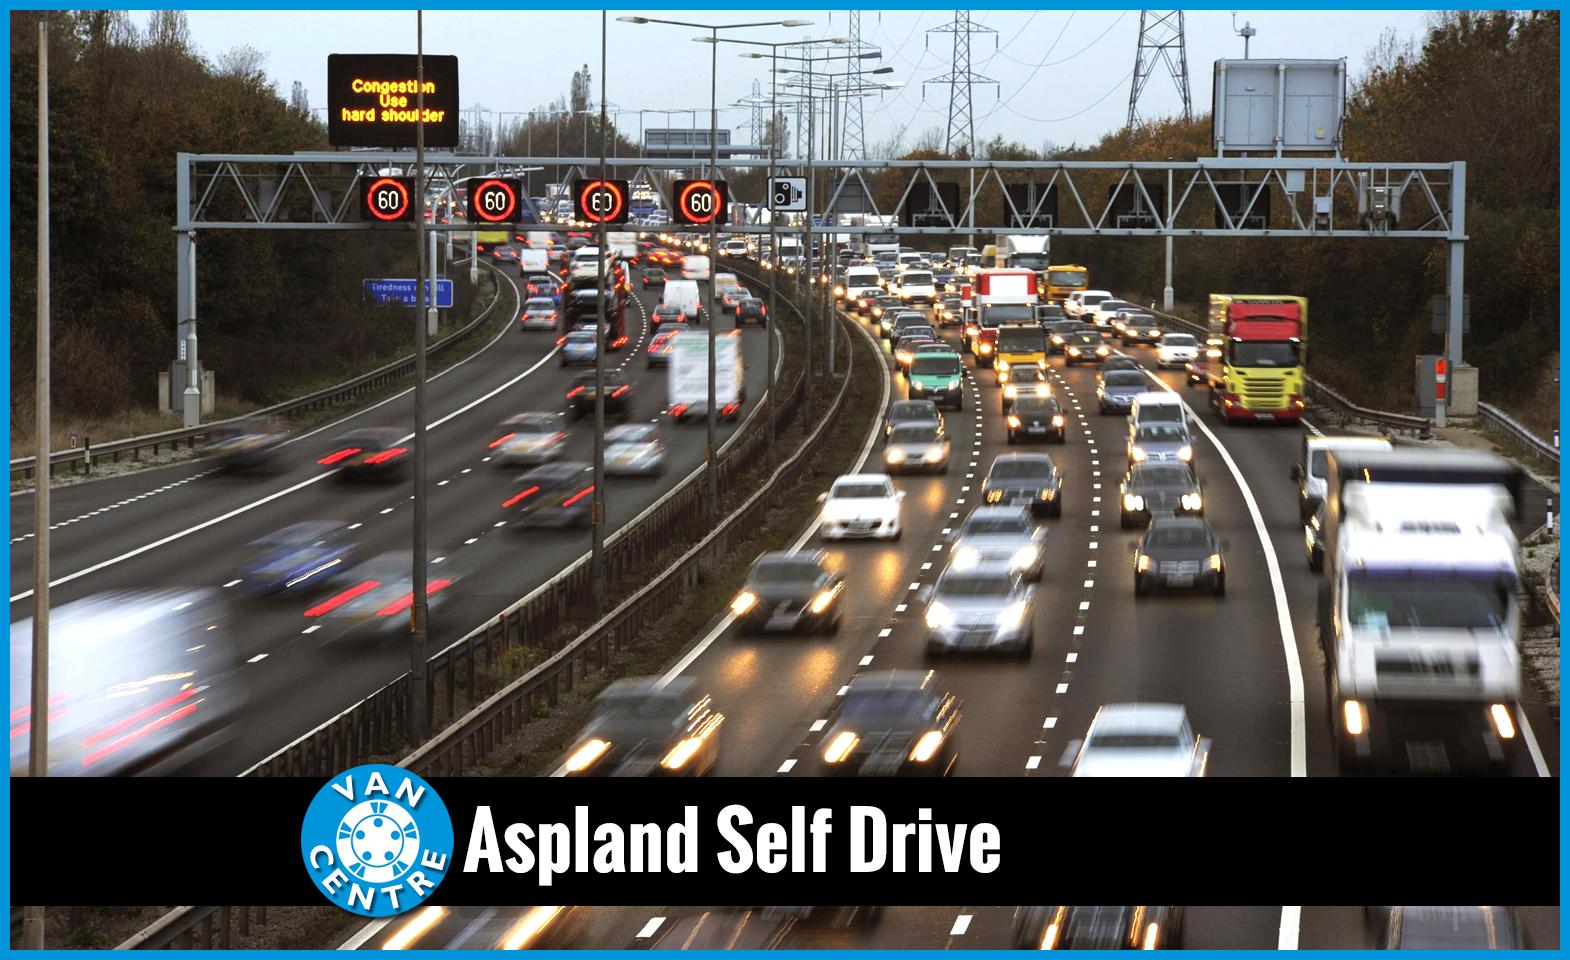 Do you use smart motorways correctly? | Aspland Self Drive, Norwich